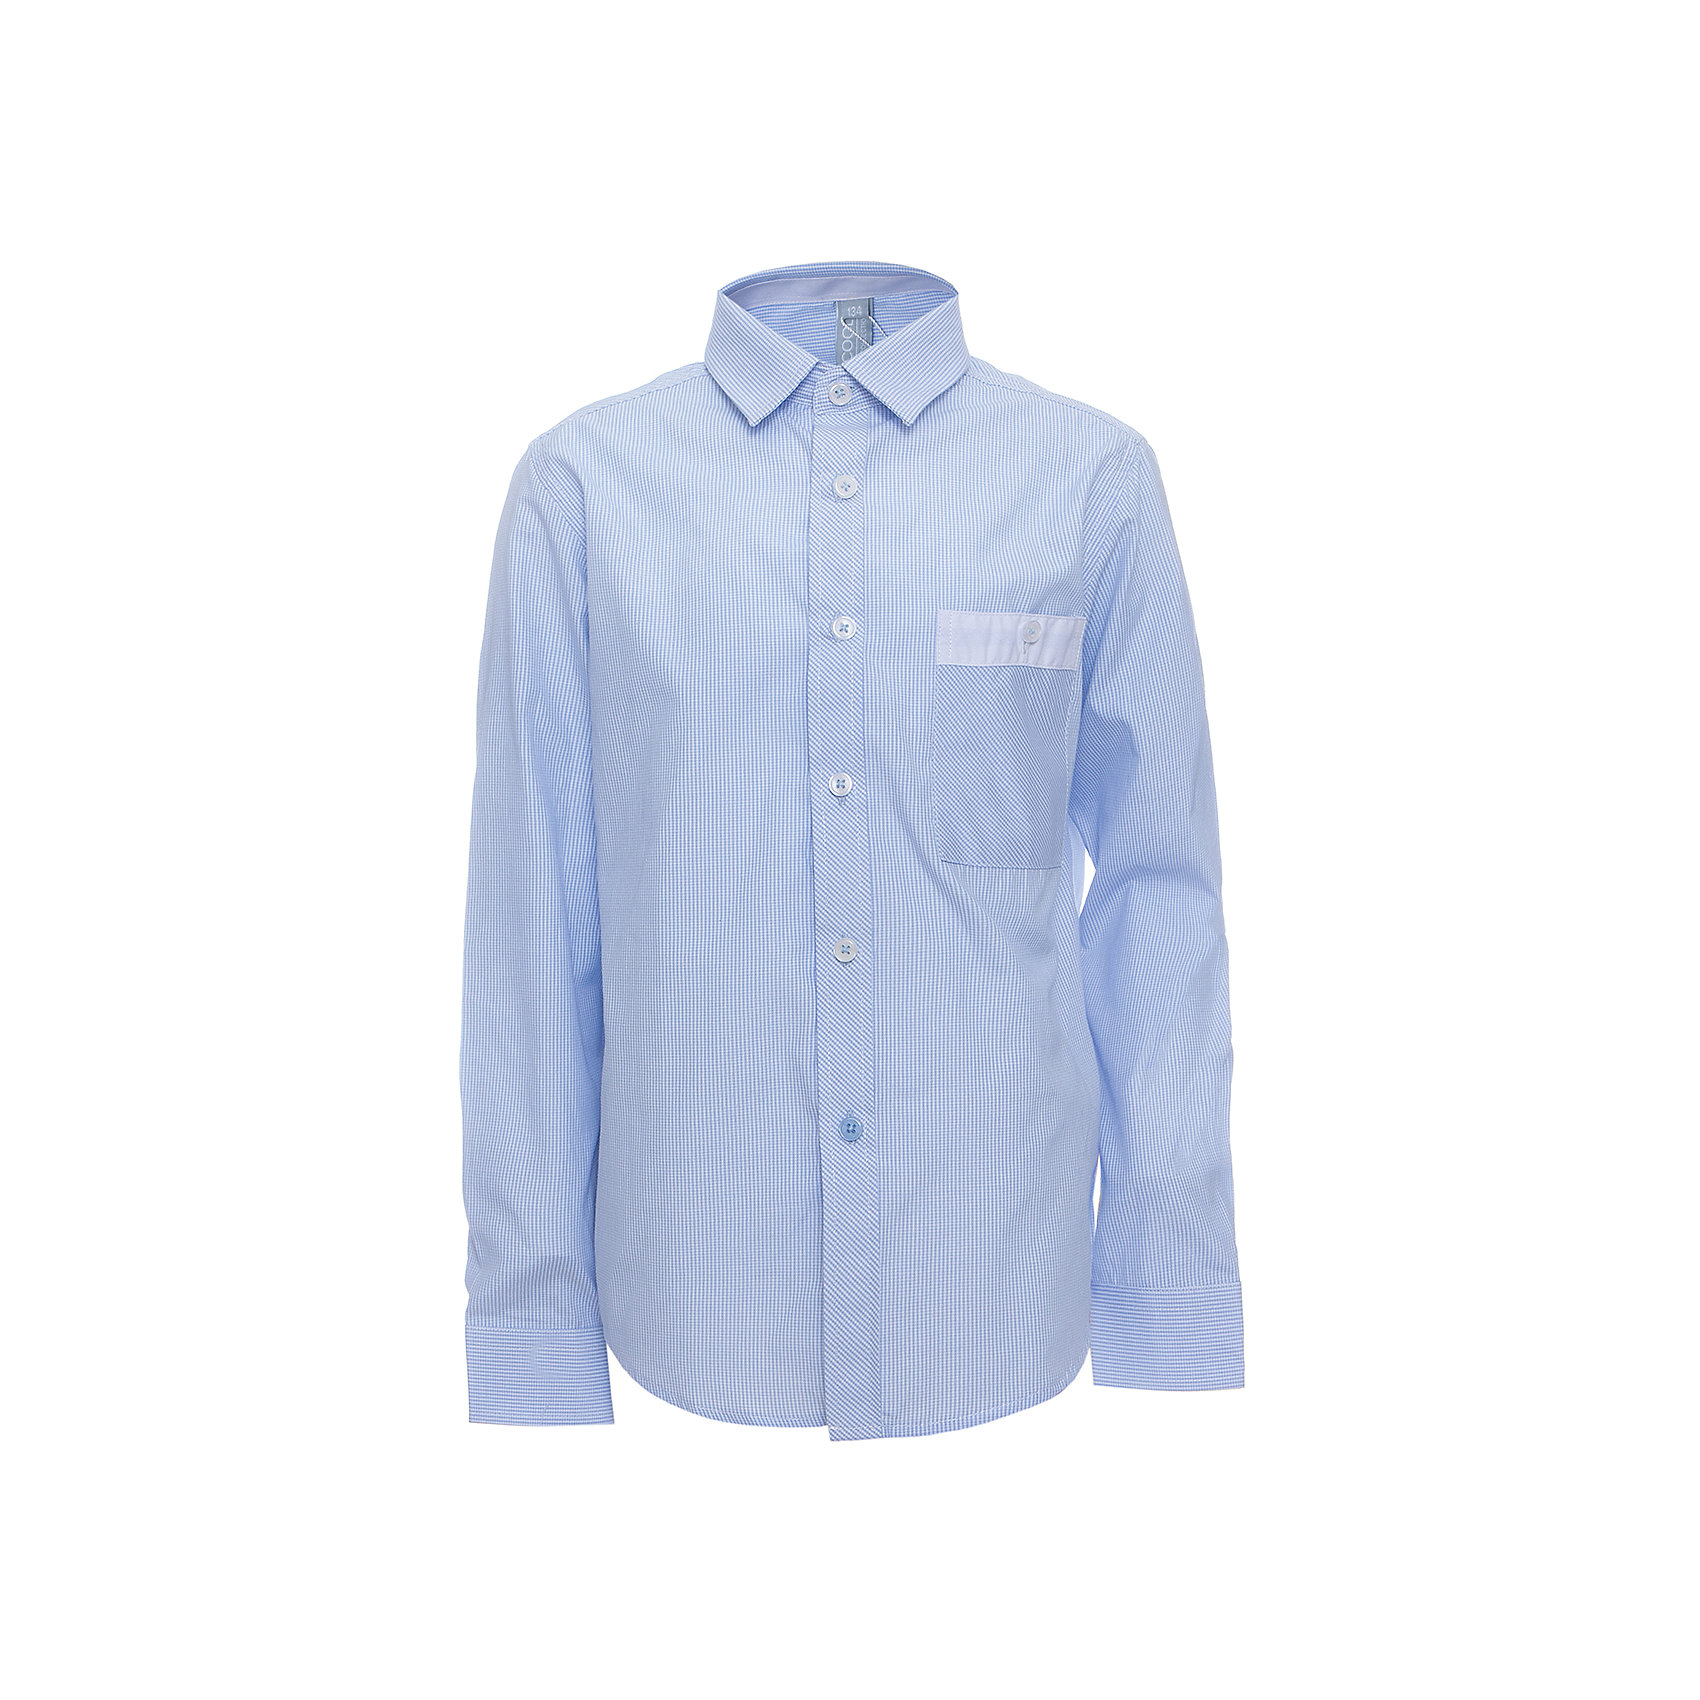 S'cool Рубашка для мальчика S'cool